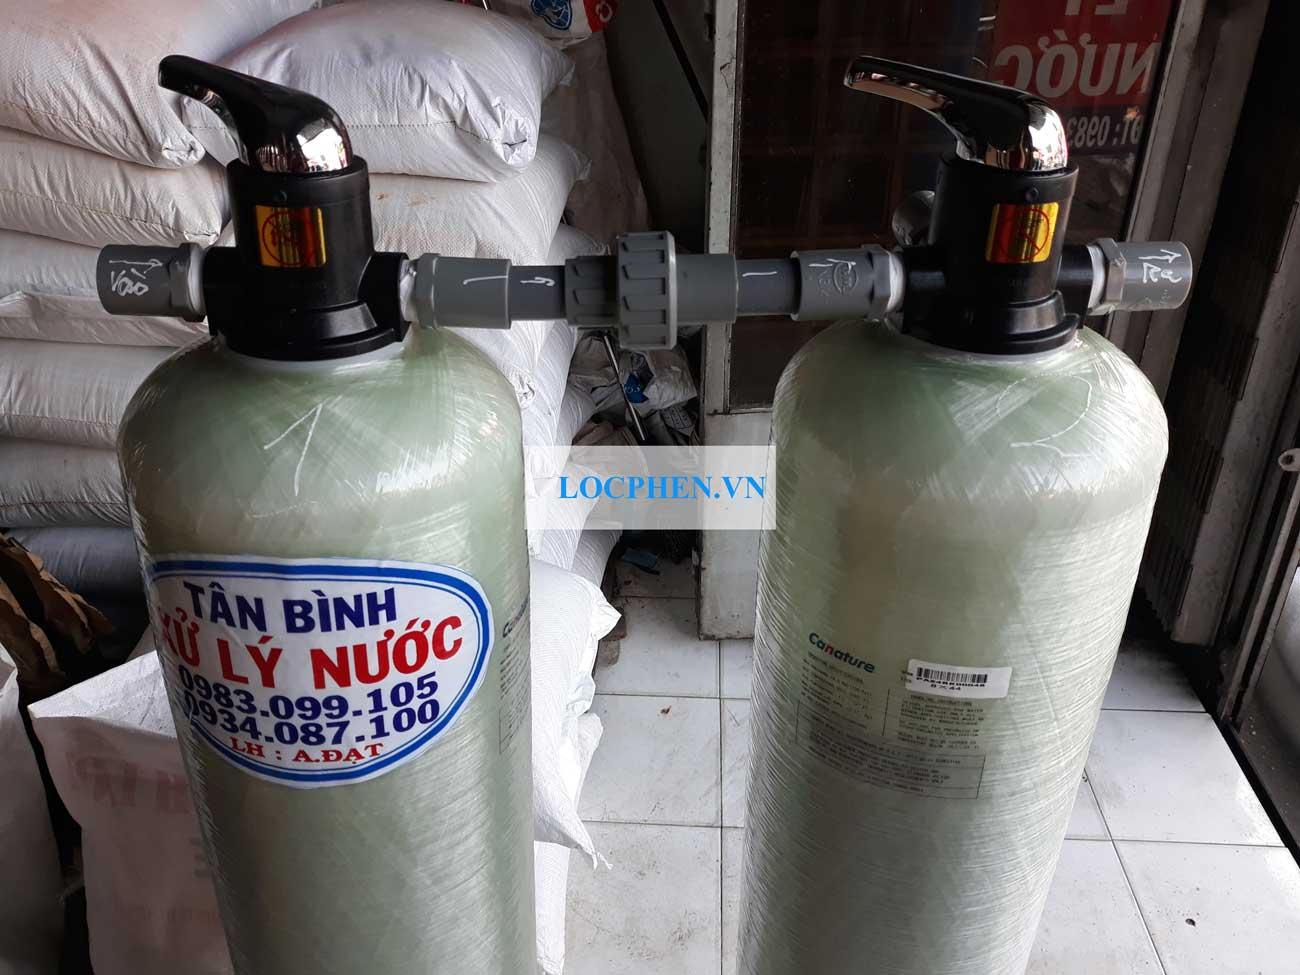 Giao cot loc nuoc may bang composite 844 tai tan phu